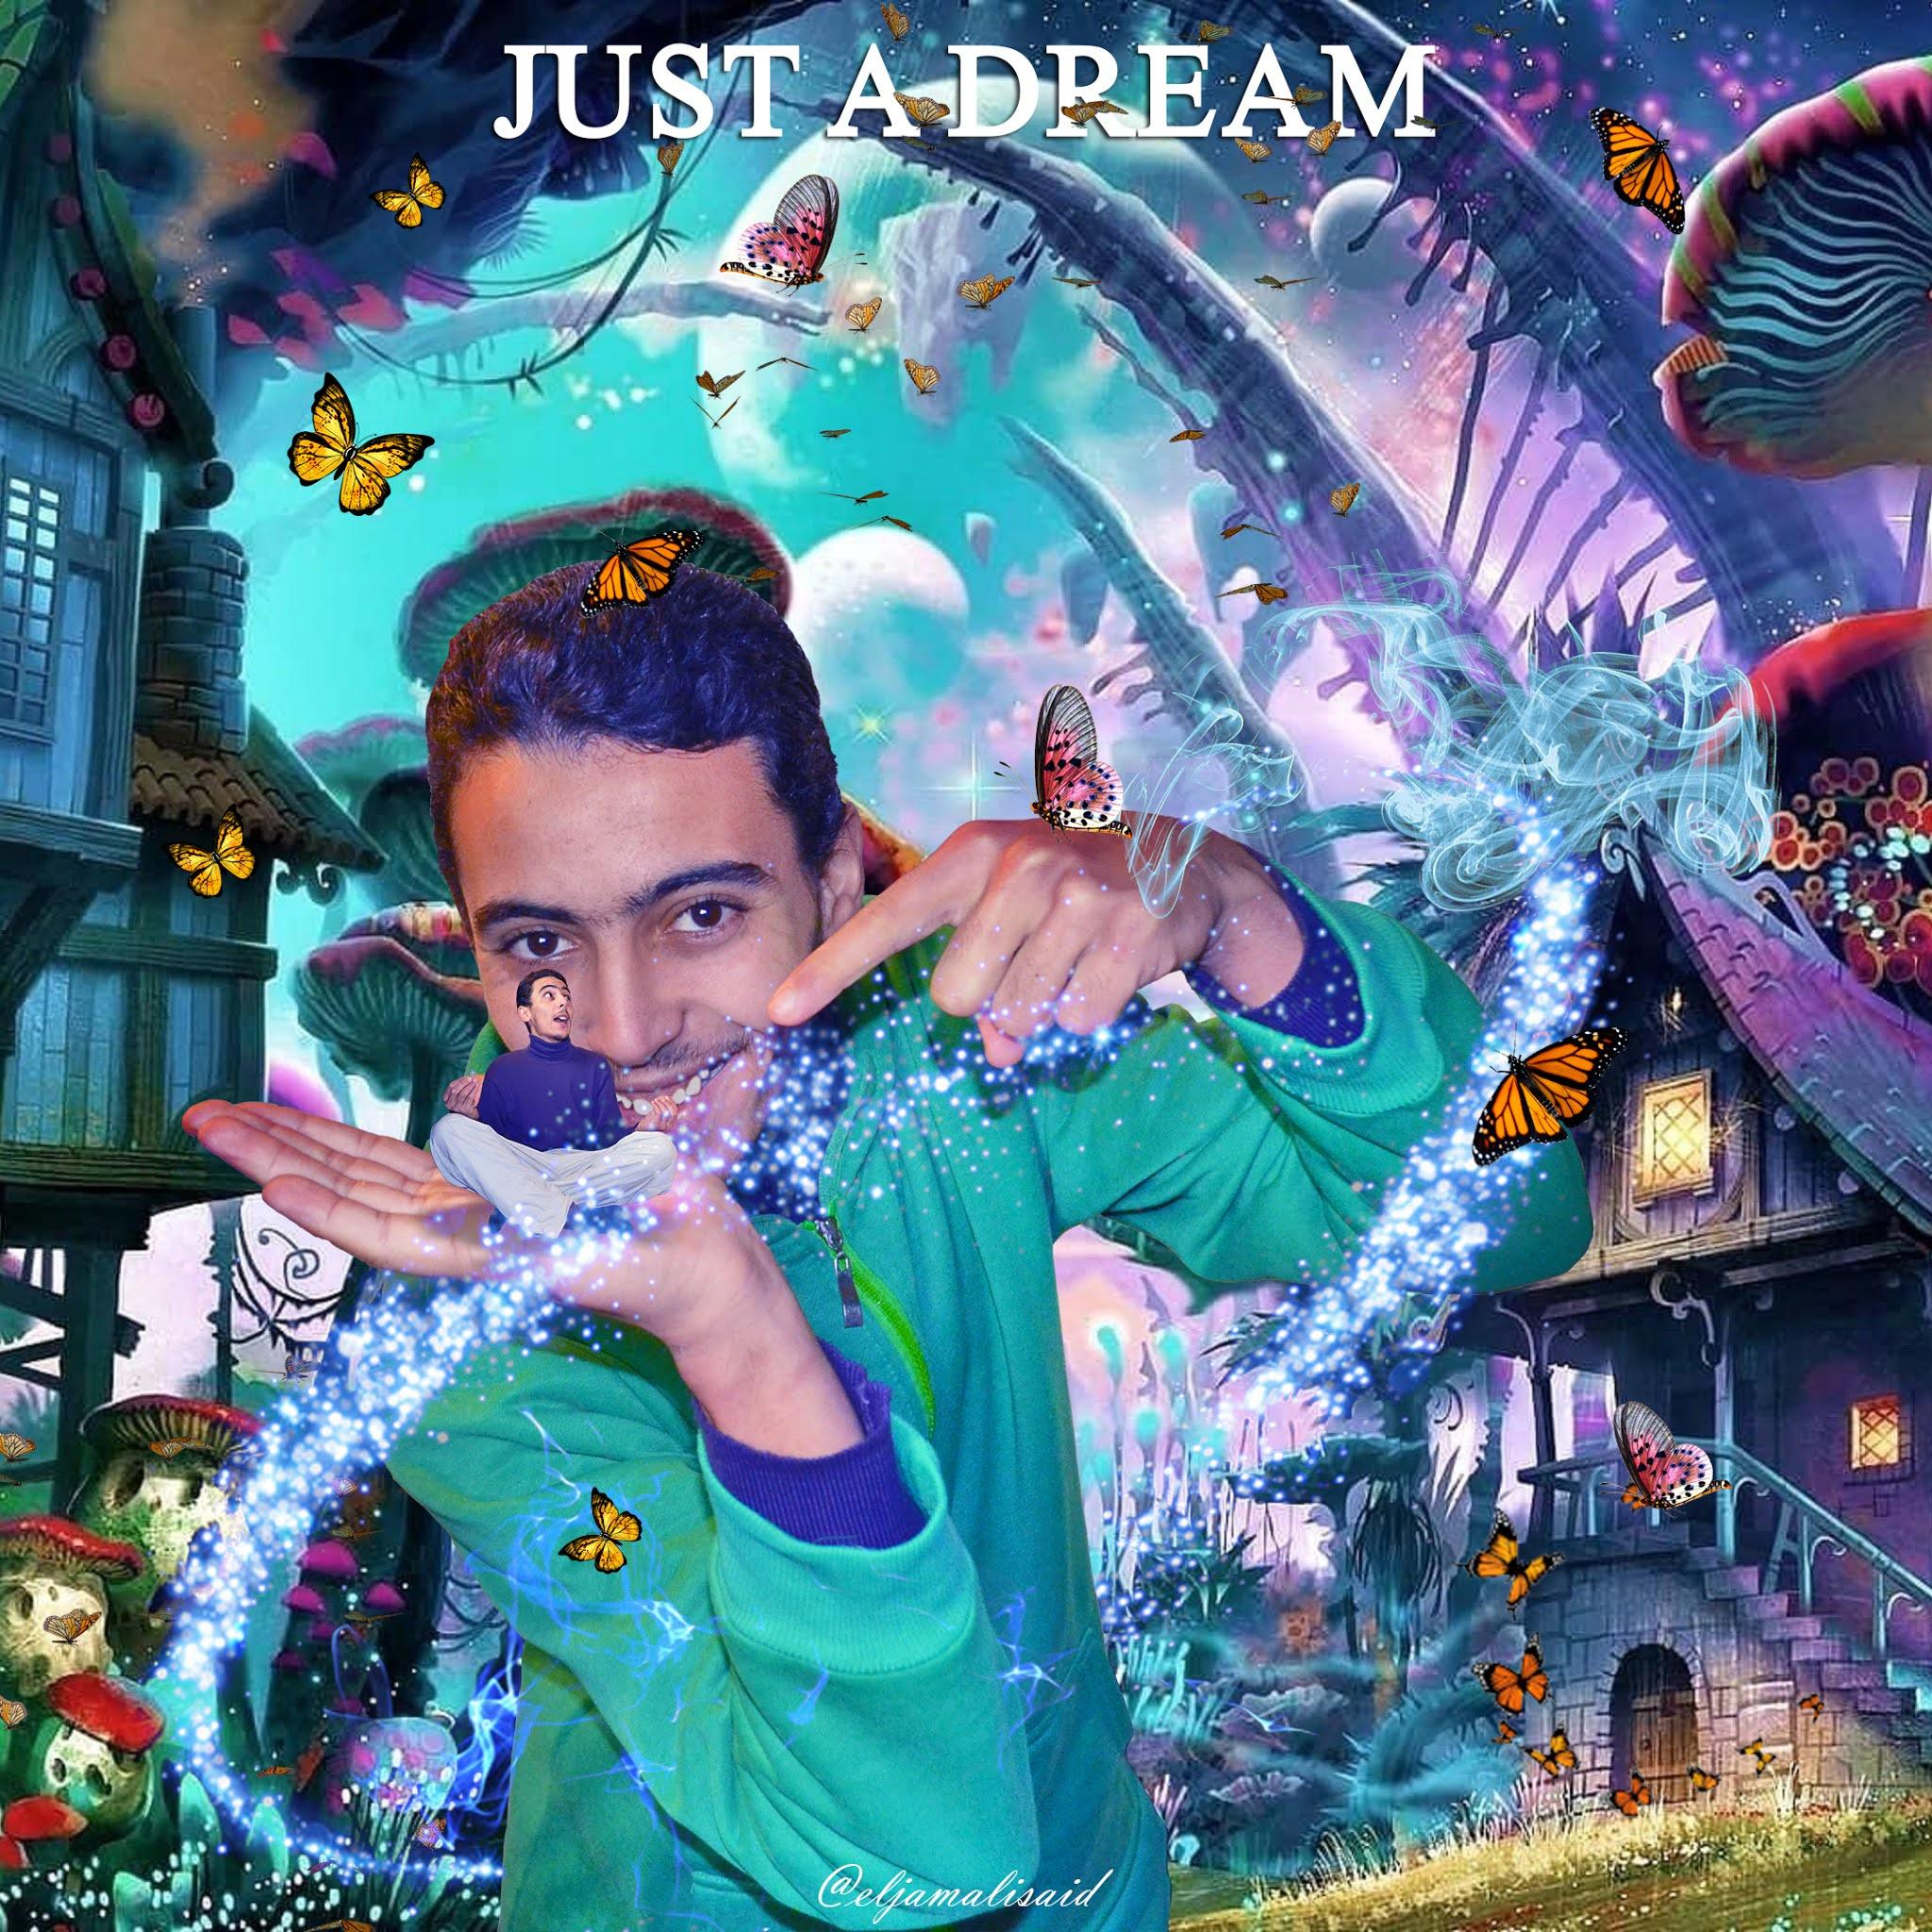 Just a Dream صورة بعنوان مجرد حلم تصميم سعيد الجمالي